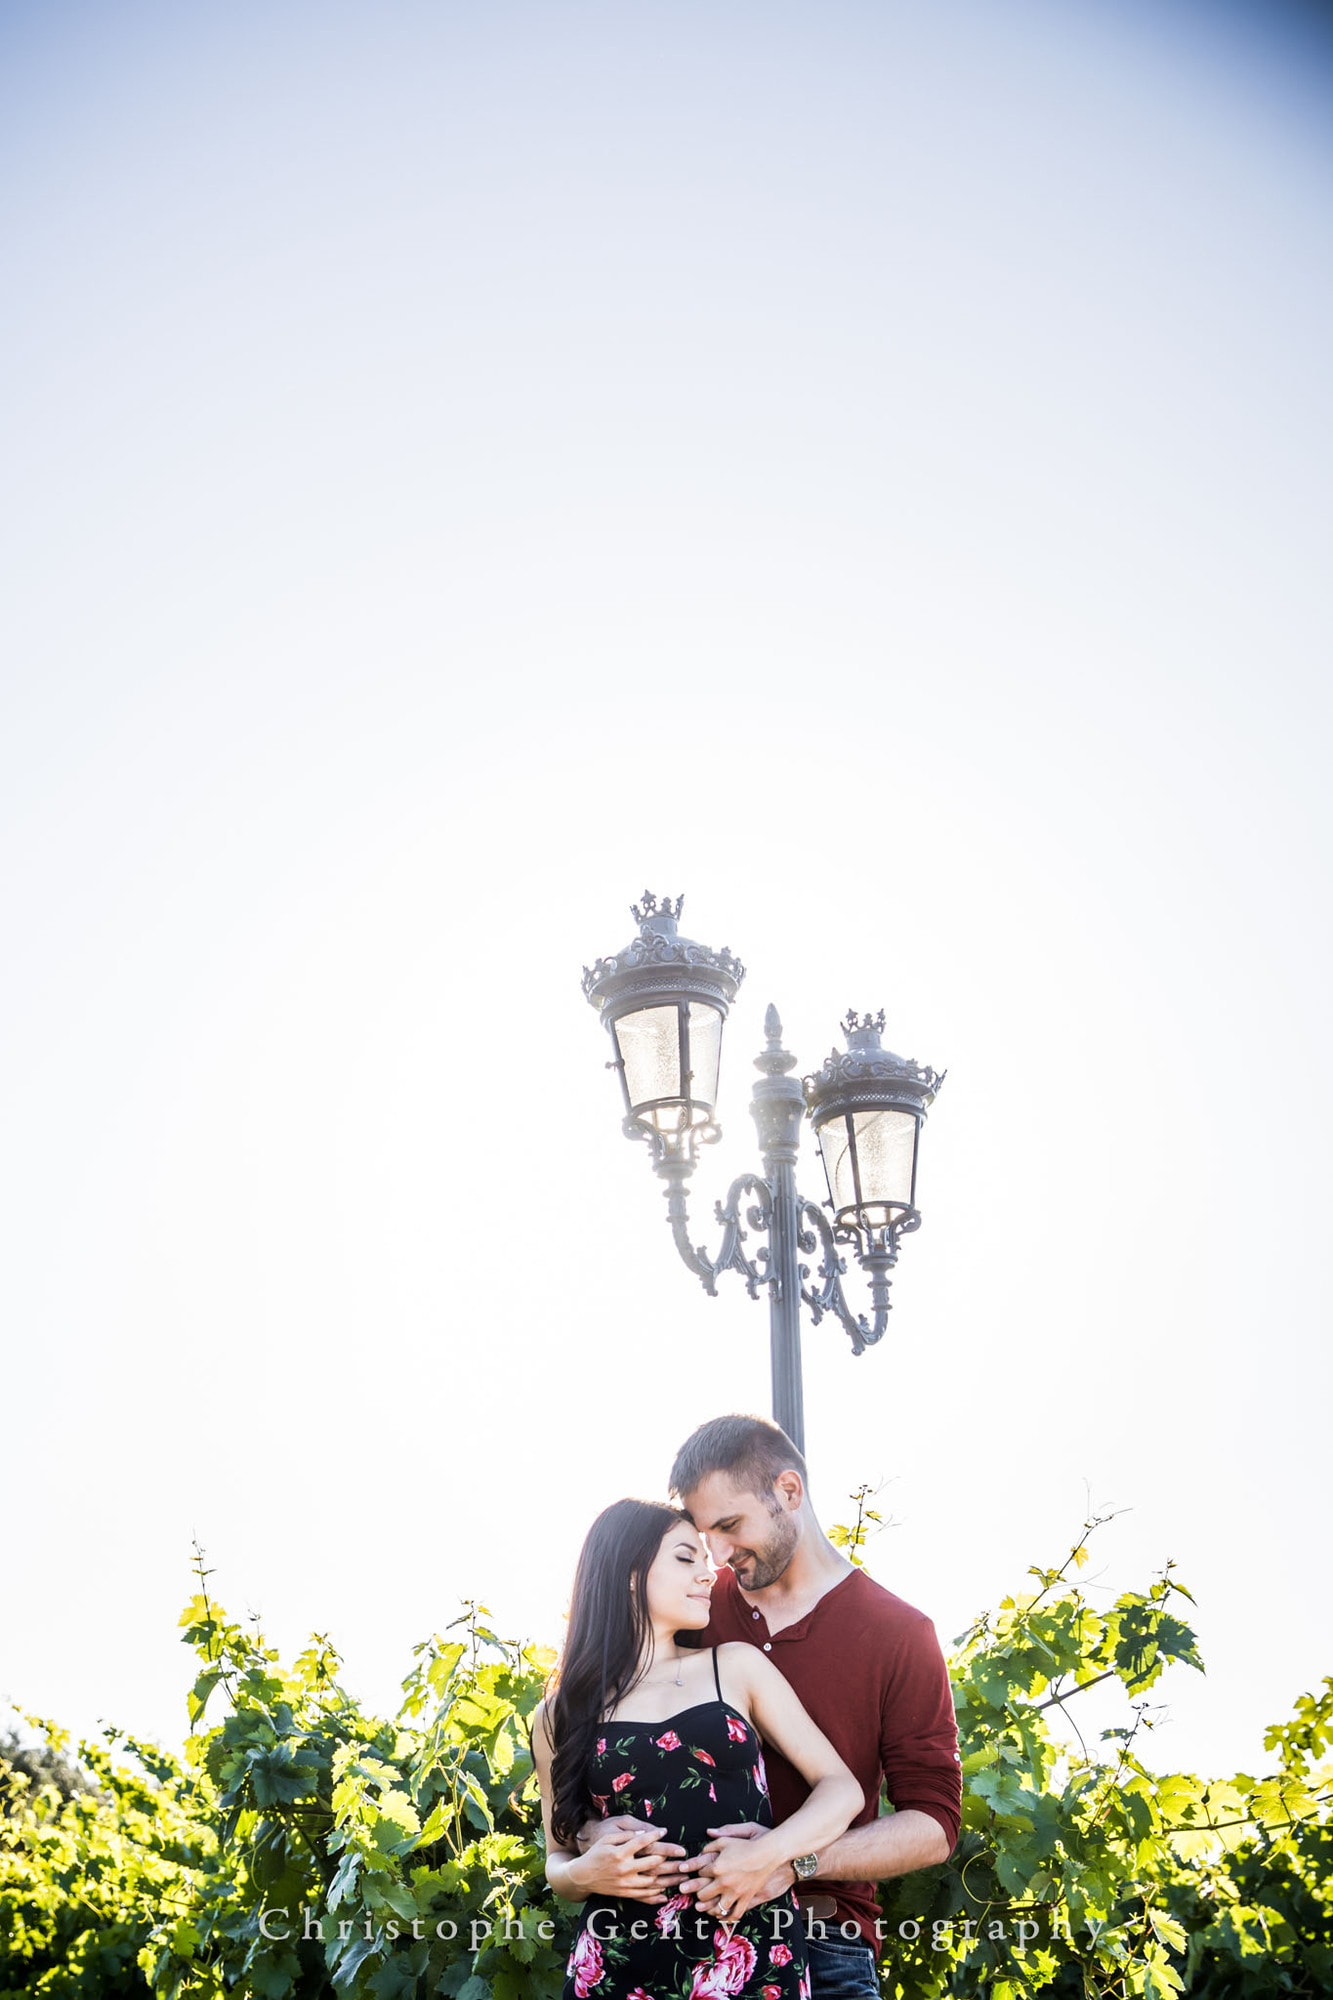 Castello di Amorosa Marriage Proposal Photography 367